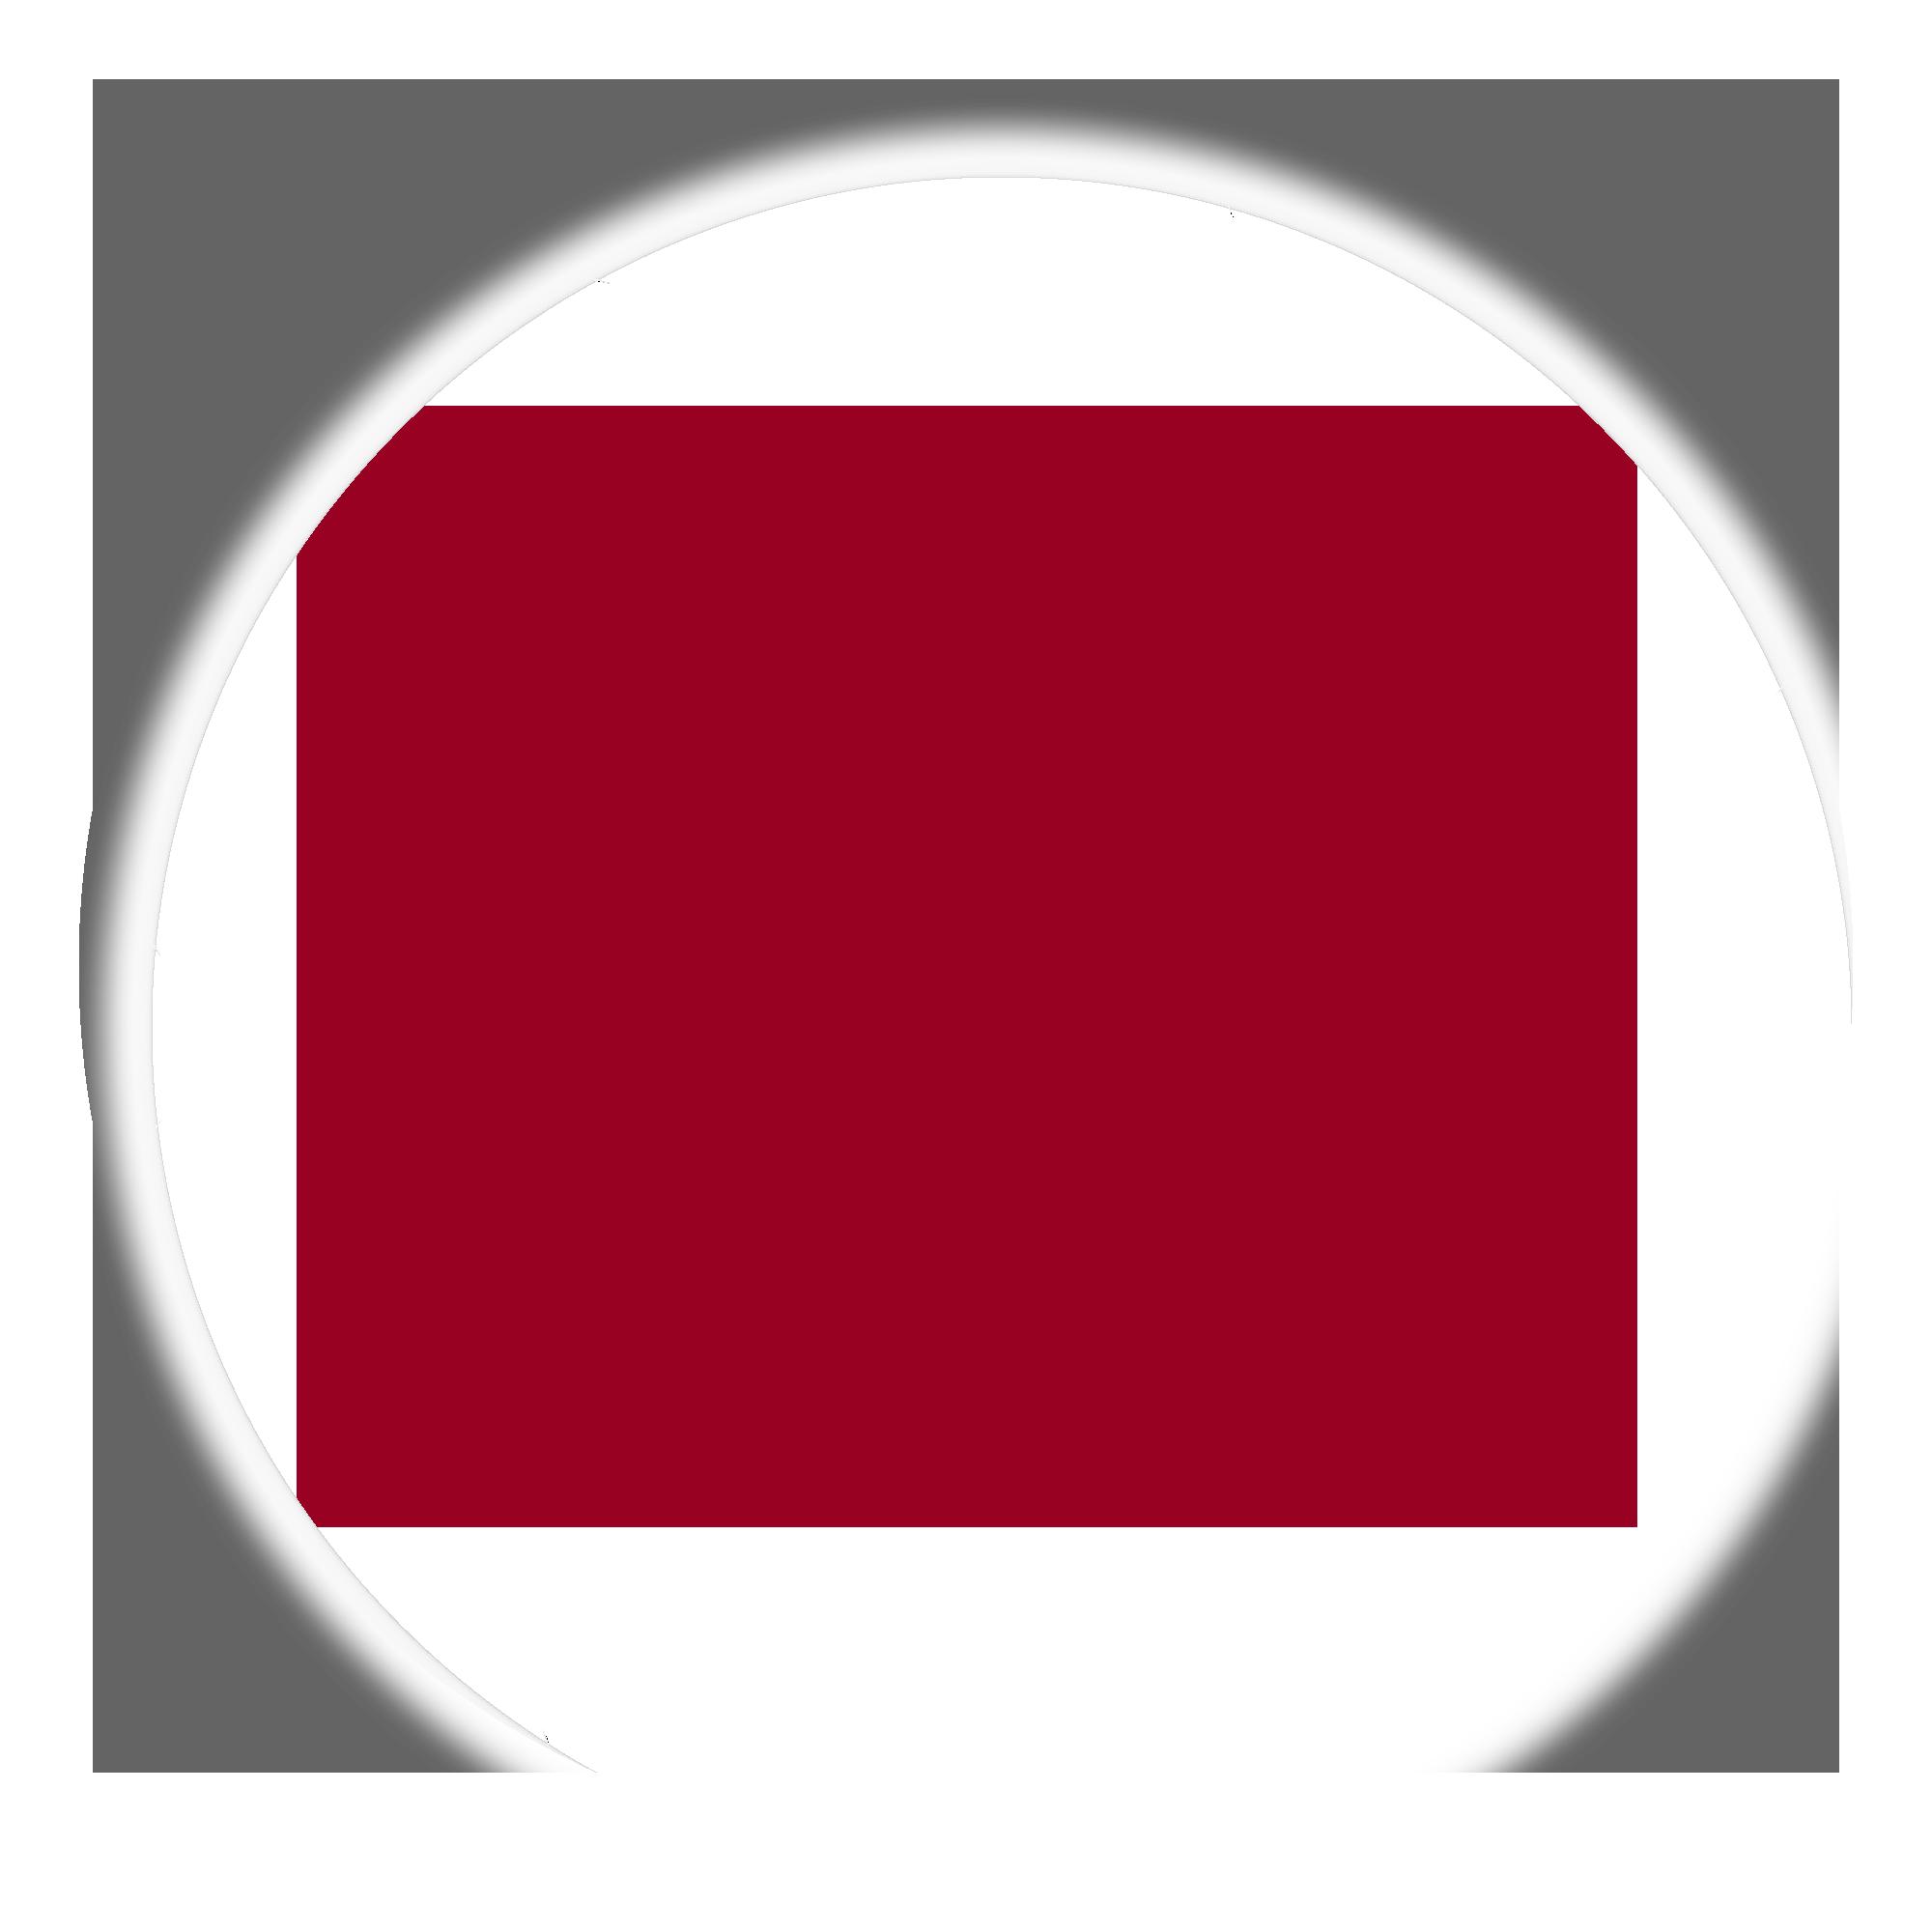 Automobile Insurance - Auto Insurance PNG